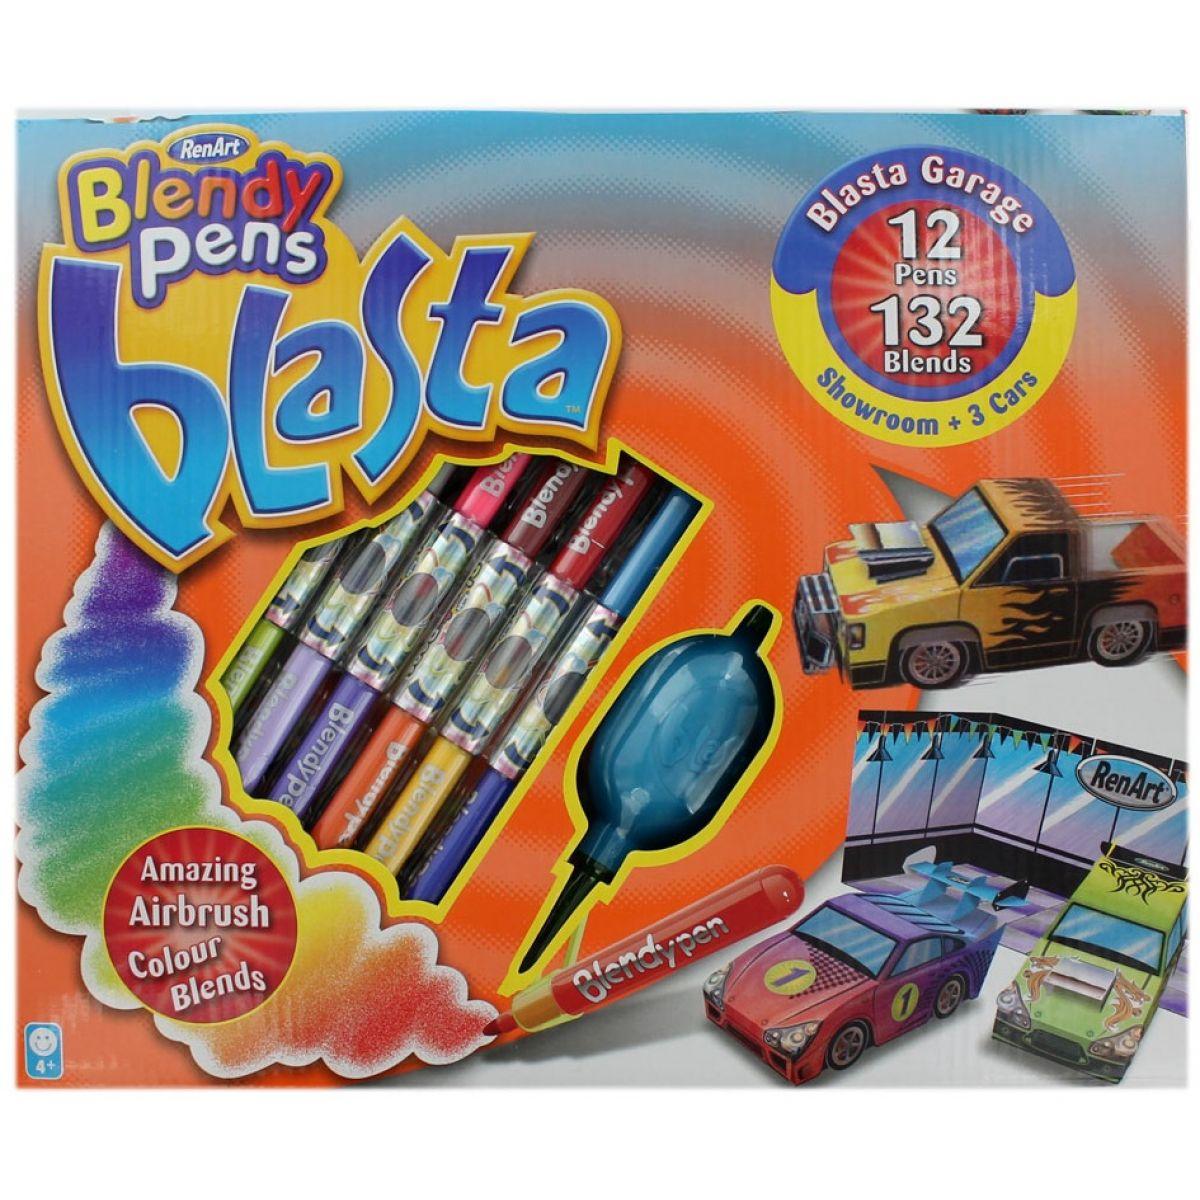 Blendy pens Blasta Garage showroom